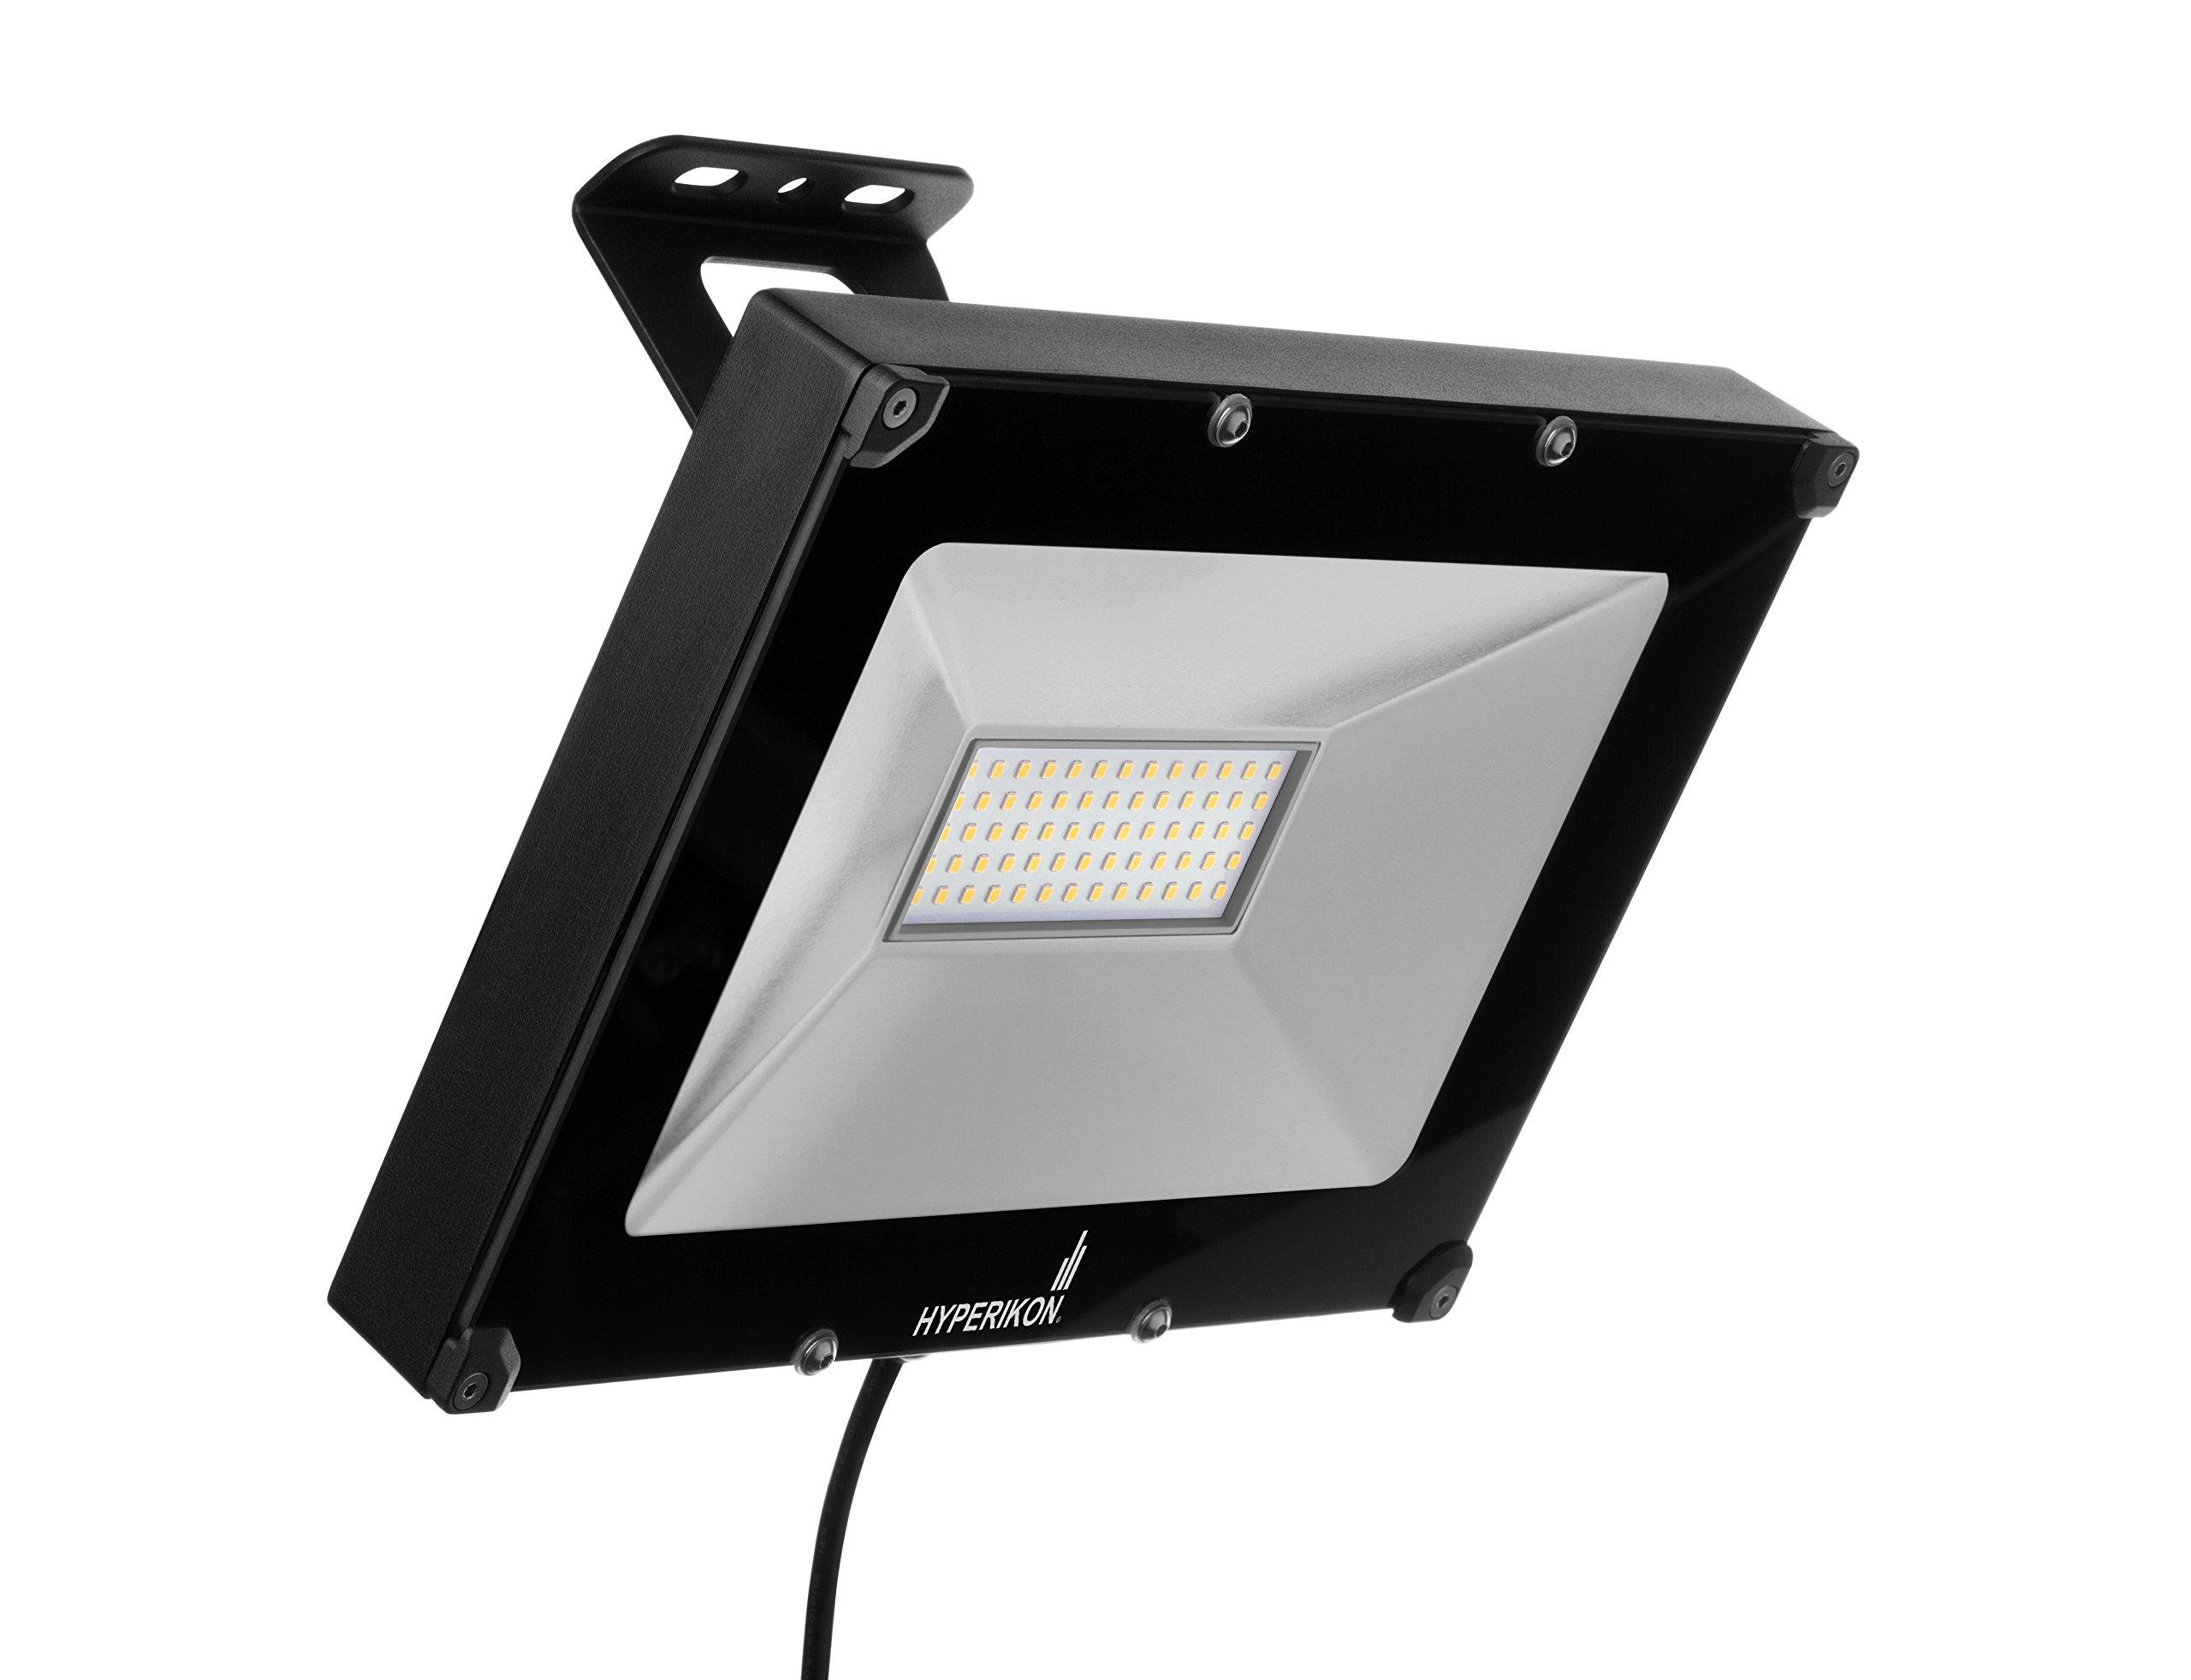 hyperikon outdoor led flood light 50w security light. Black Bedroom Furniture Sets. Home Design Ideas